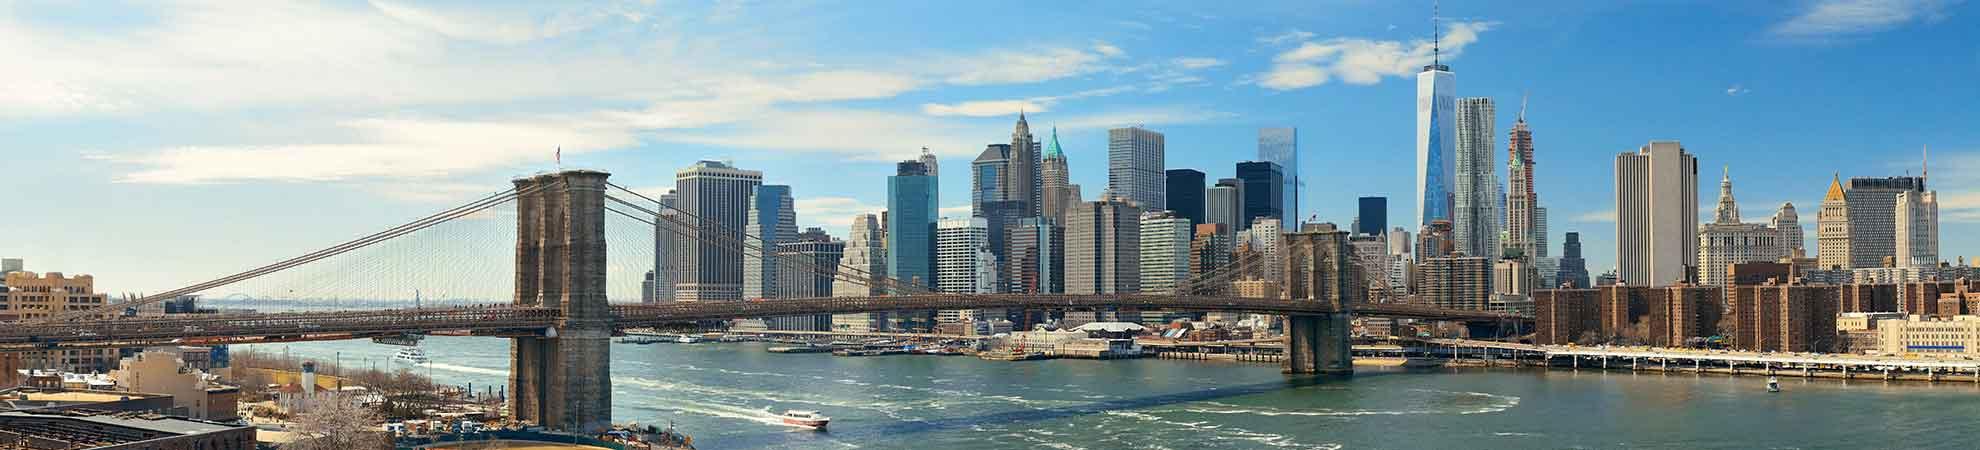 Voyage organisé New York